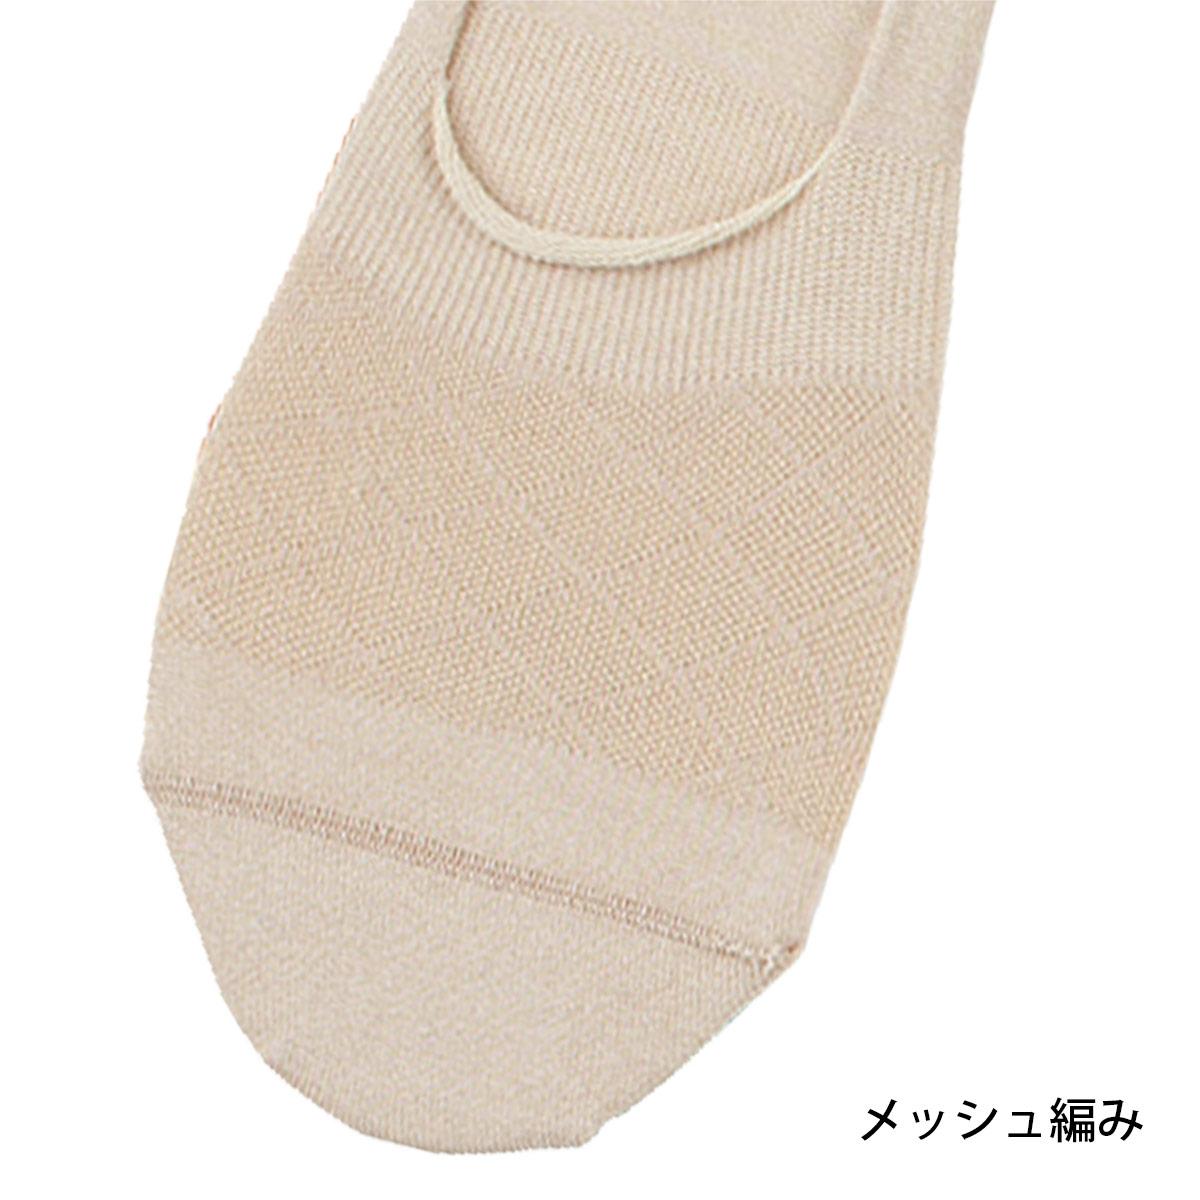 Calvin Klein (カルバンクライン) Simple Mesh シンプル・メッシュ フットカバー レディース ソックス 靴下 3265-431【ゆうパケット・6点まで】